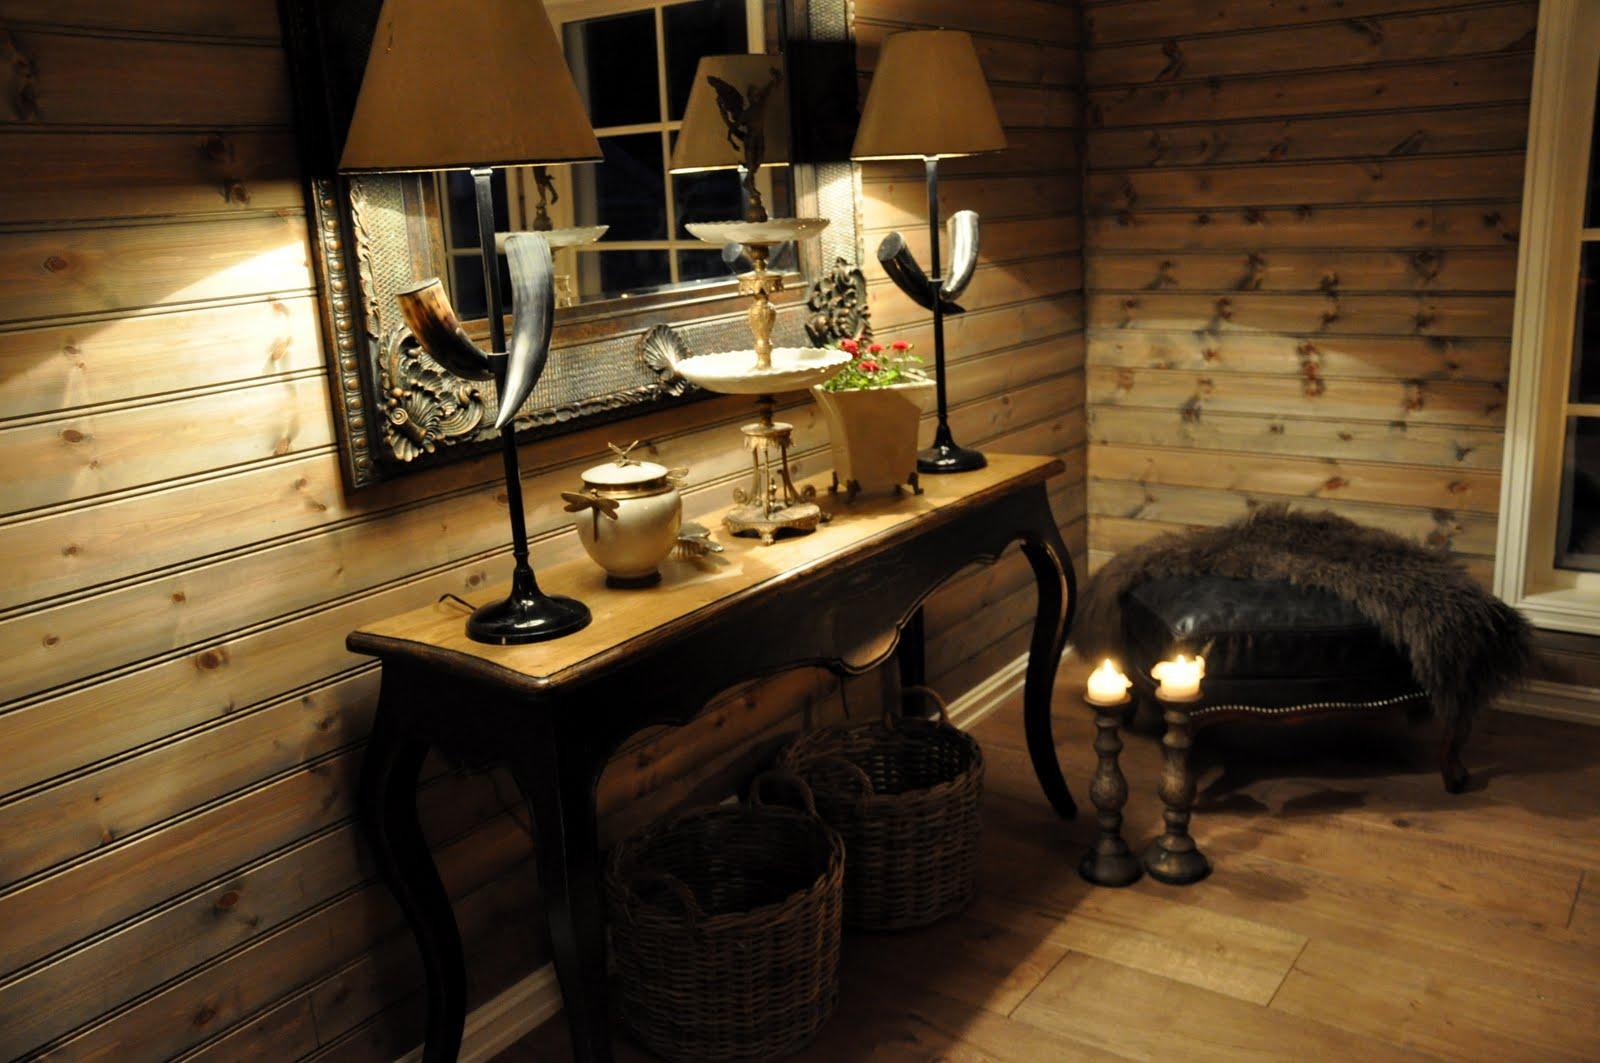 #AD8F1E Bedst Huset I Skogen: Ehh . Stil Eller  Fransk Landkøkken Stil 4823 160010634823